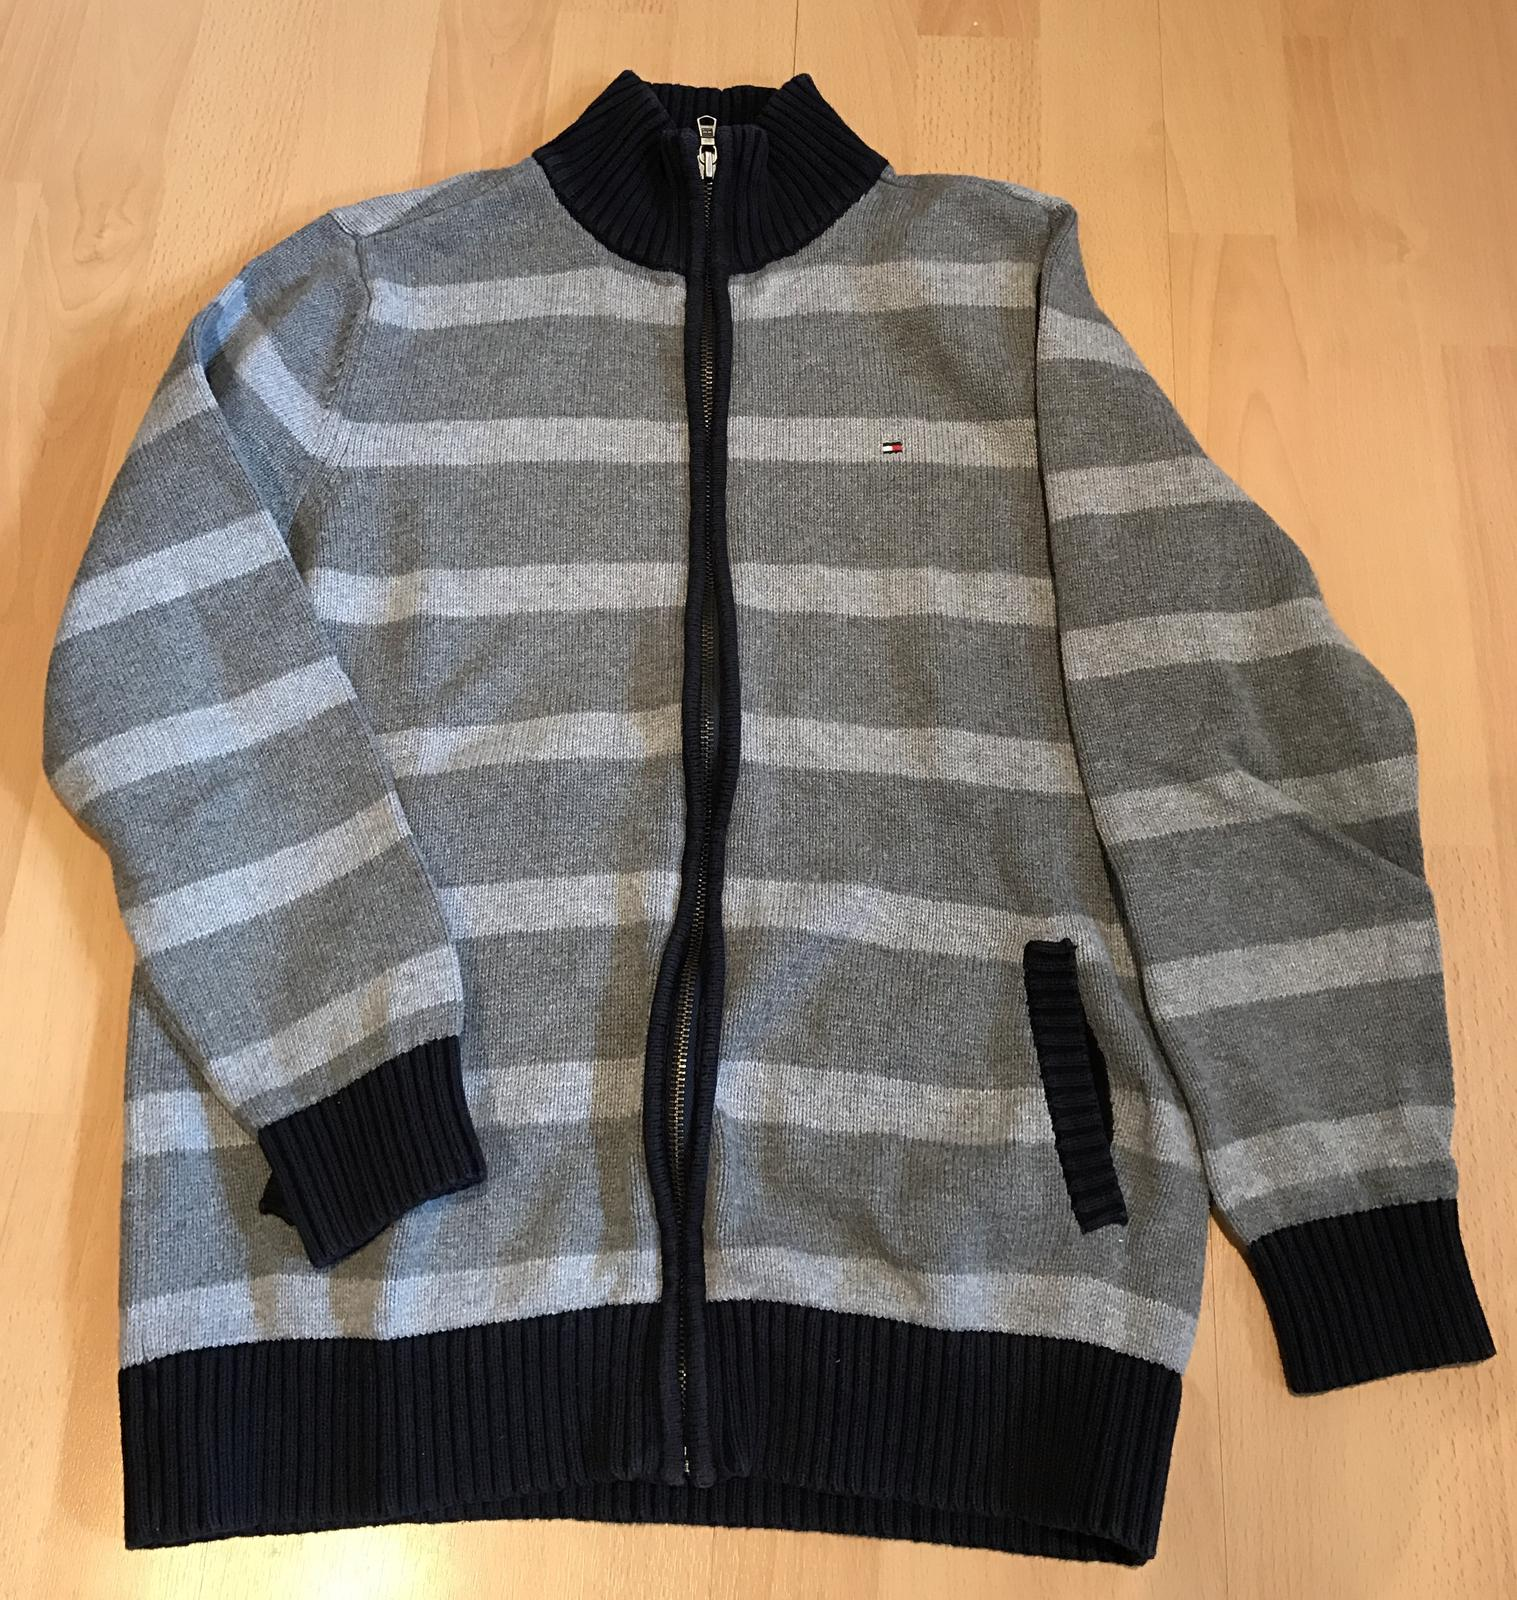 f127959057 Tommy hilfiger chlapčenský sveter